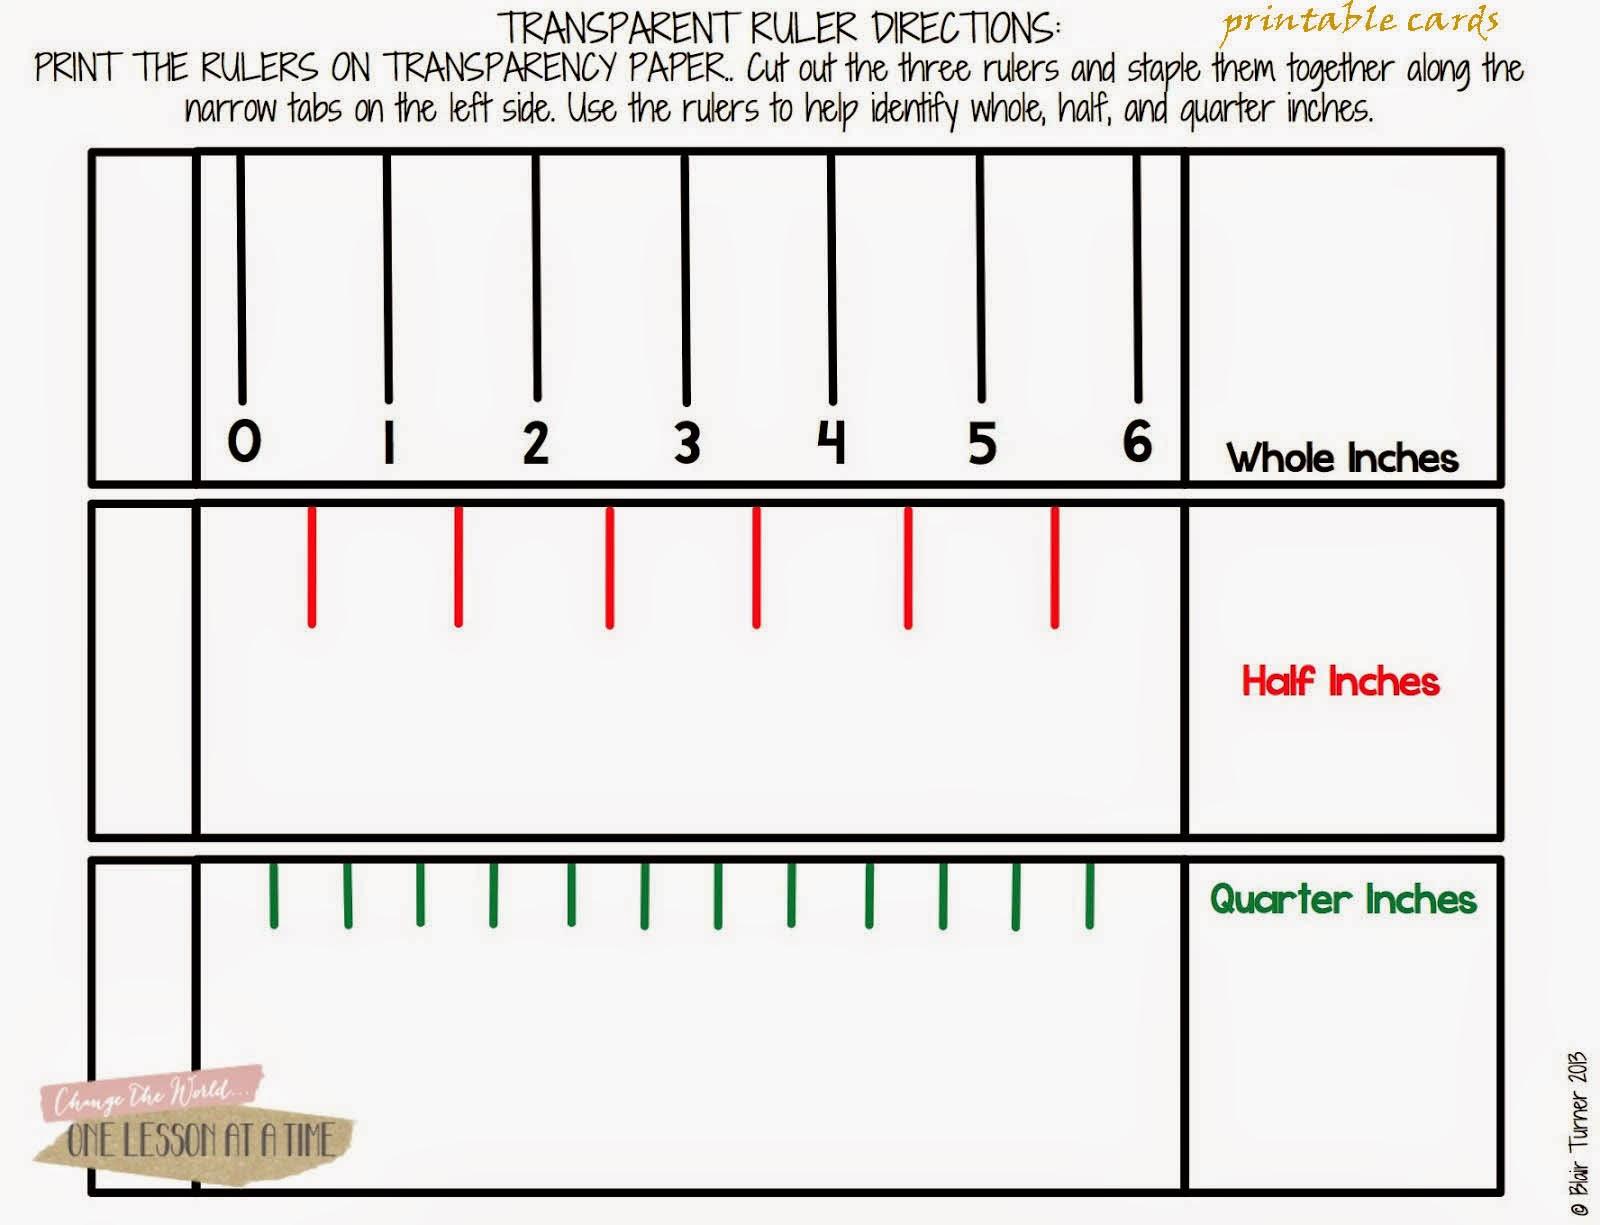 Free Printable Cards Free Printable Ruler